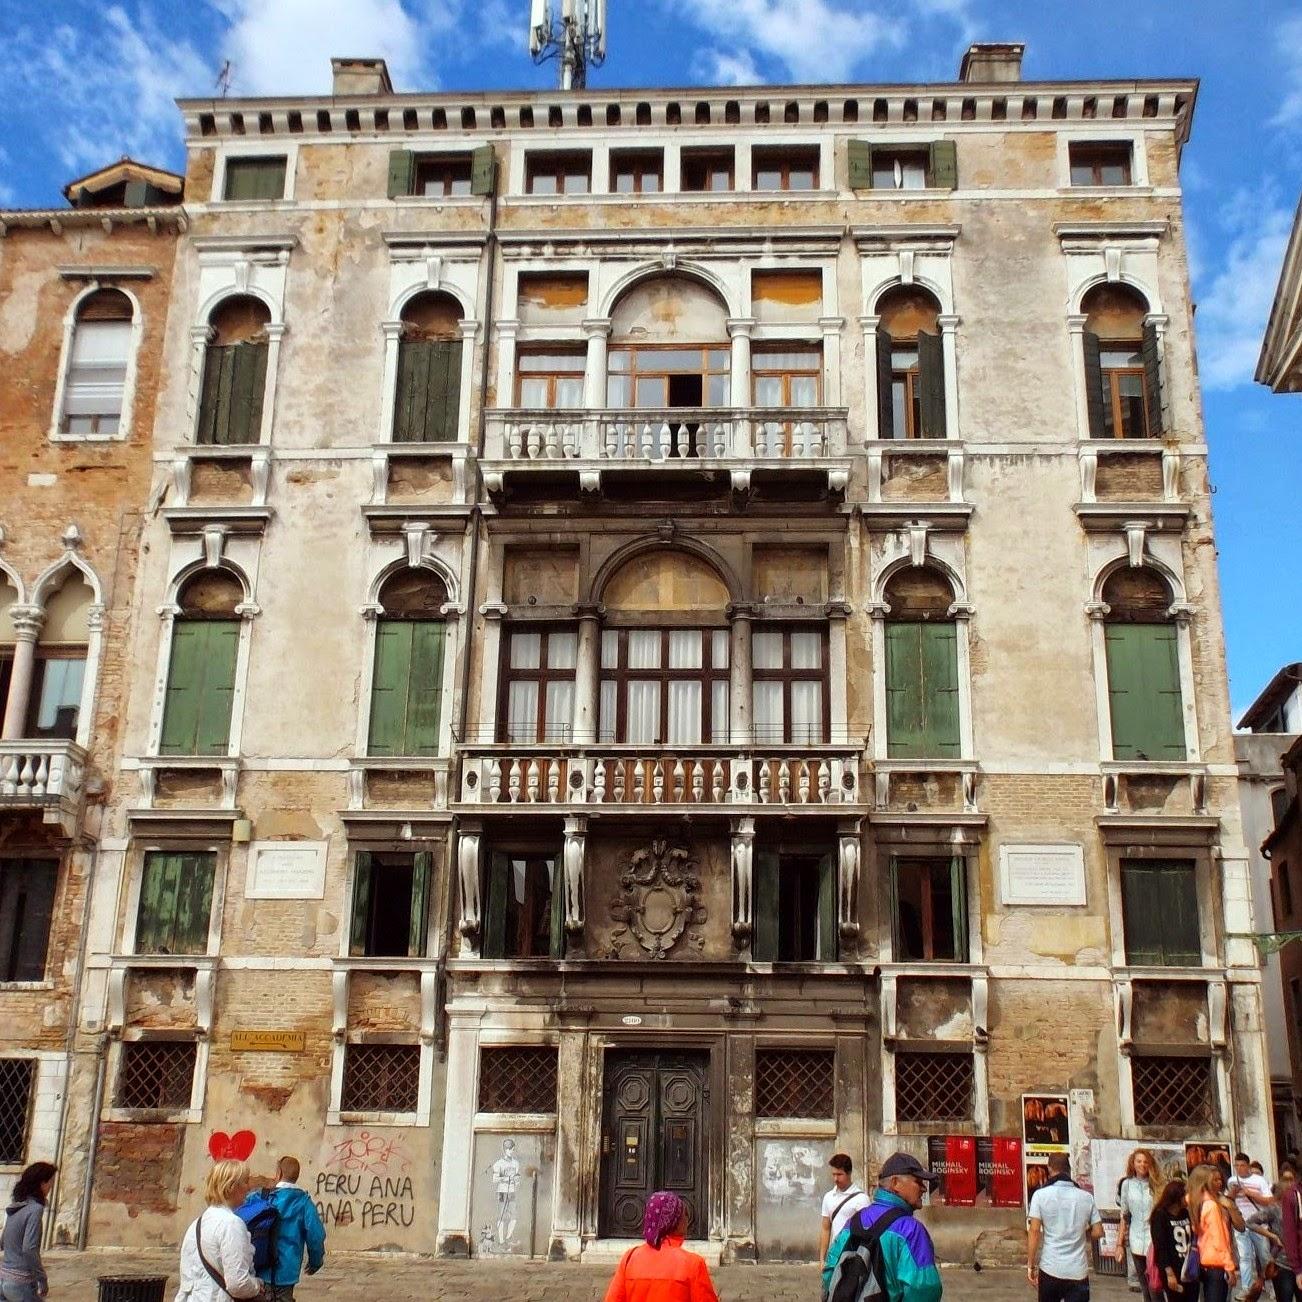 Palazzo Bellavite in Venice, once the home of the poet, Giorgio Baffo.